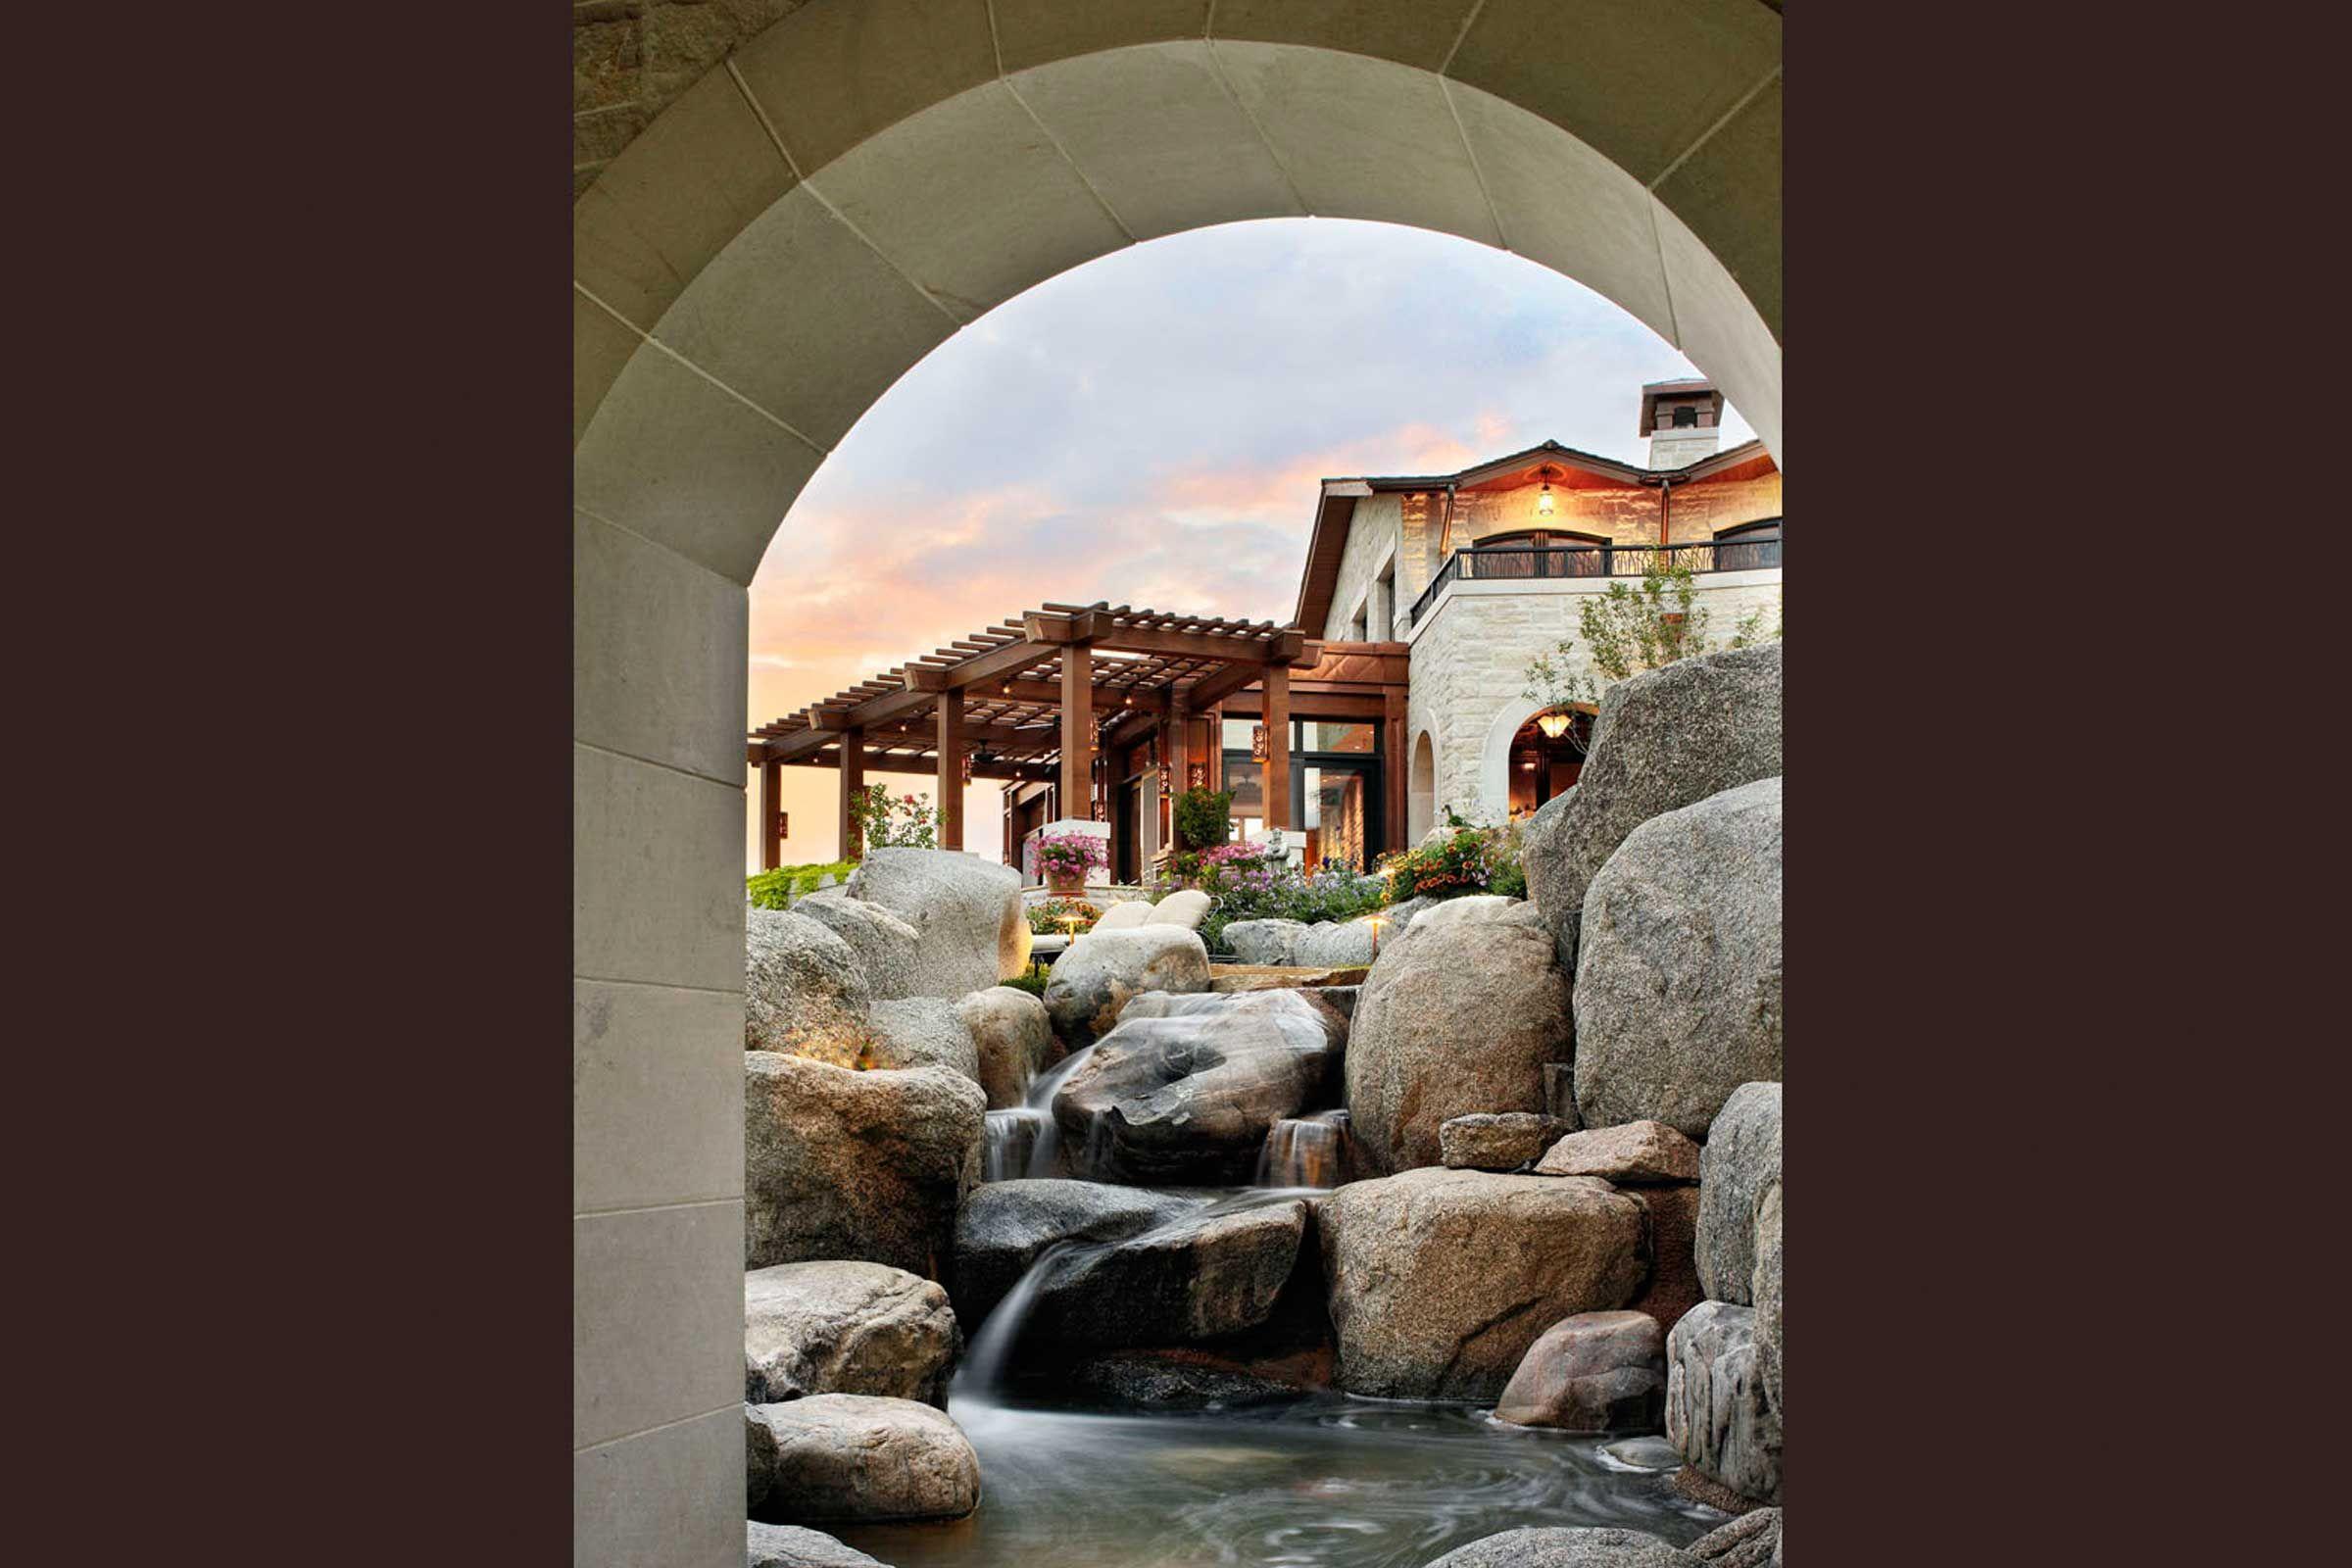 Crescent House - Clutch Design Studio : Clutch Design ... on Front Range Outdoor Living id=53133